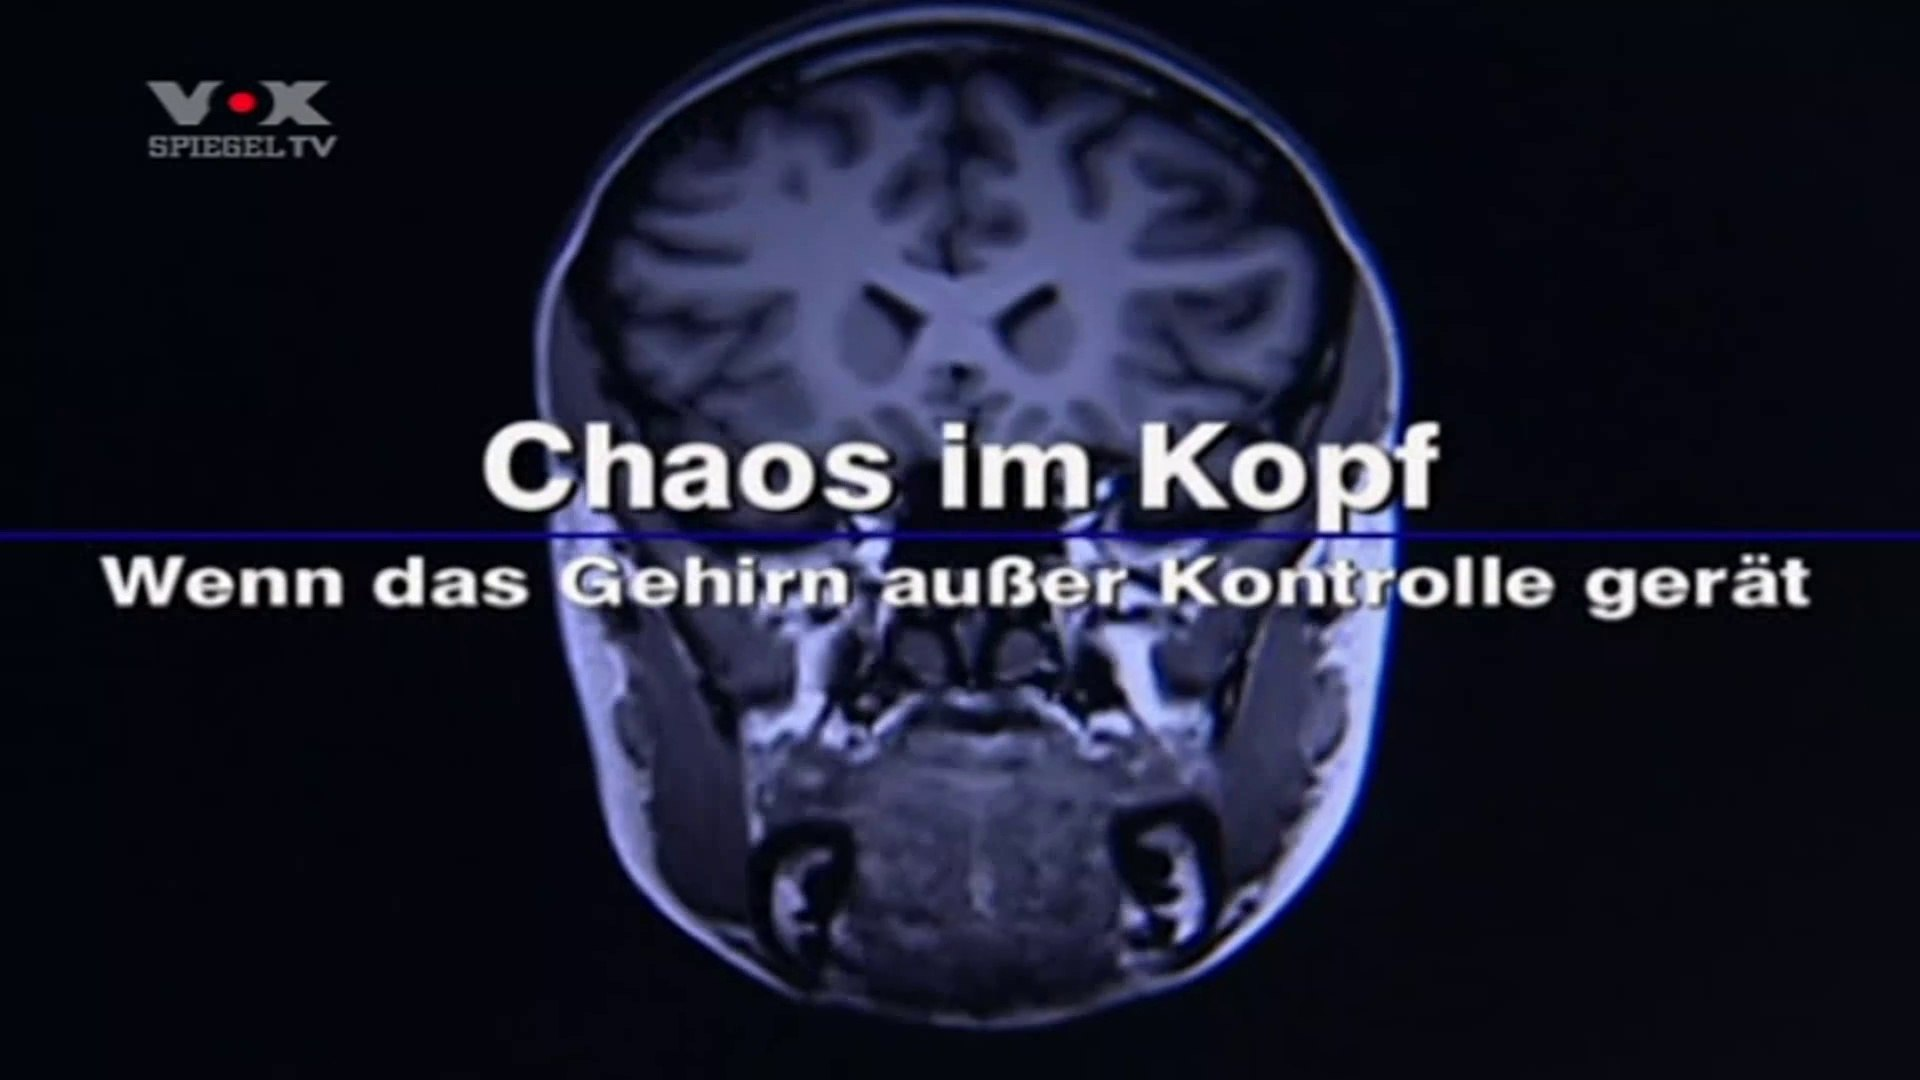 Chaos im Kopf 1v2 Wenn das Gehirn ausser Kontrolle gerät 2008 by ARTBLOOD